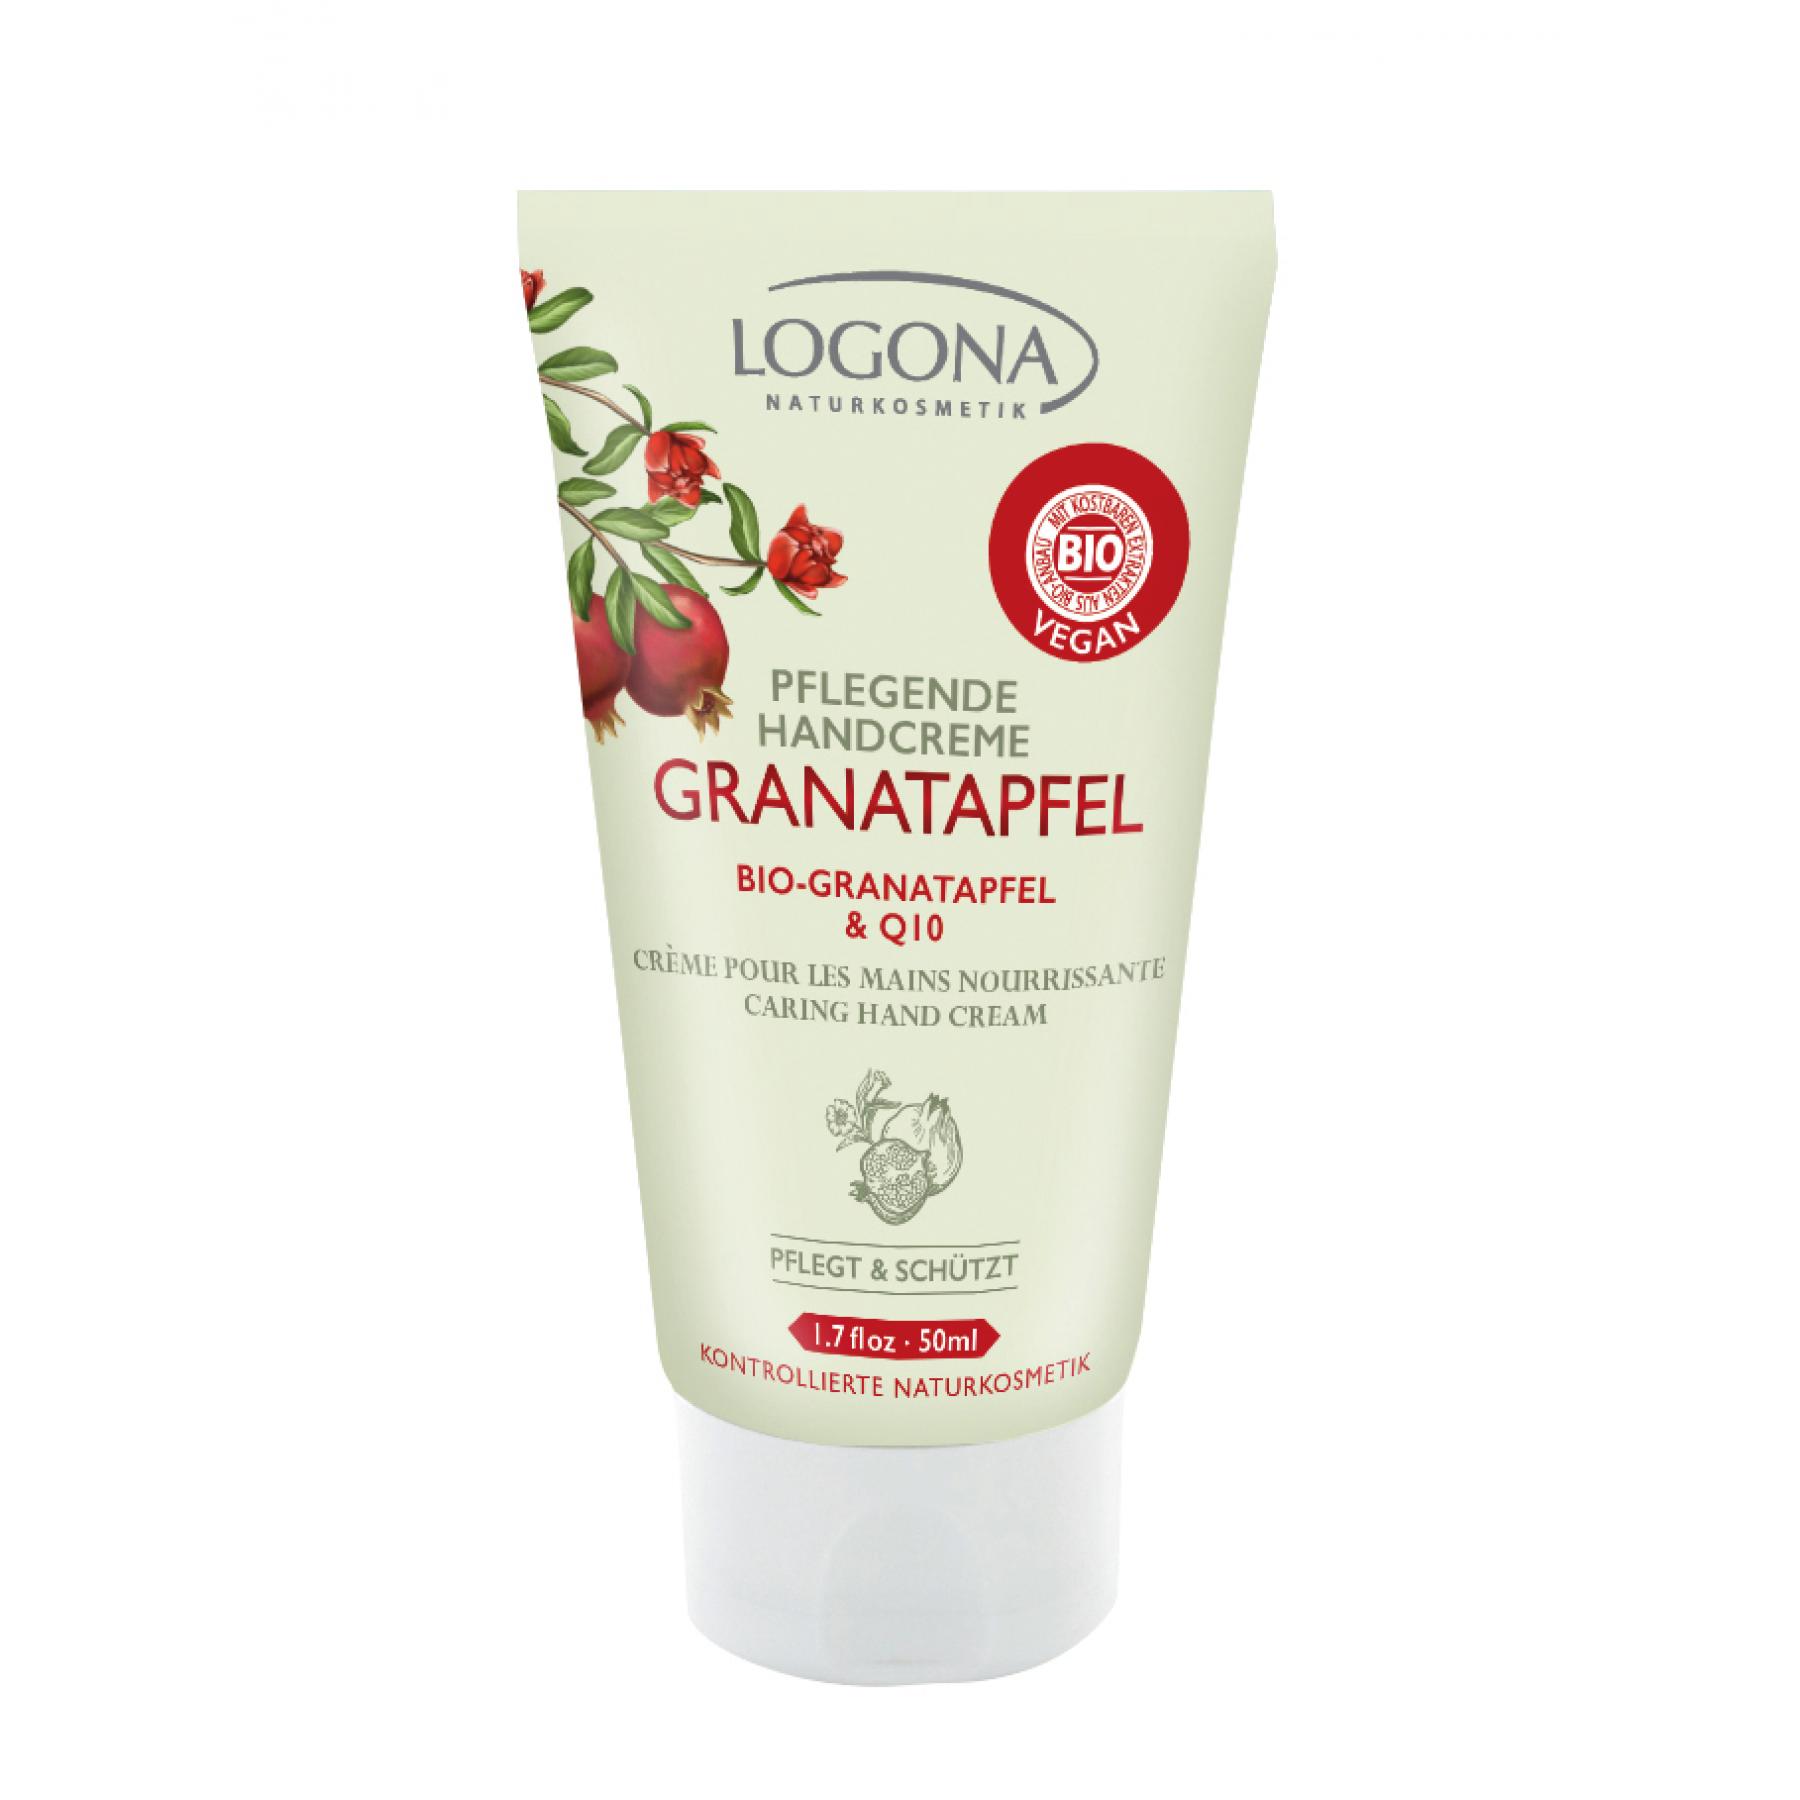 Håndkrem Granateple Q10 - 50ml